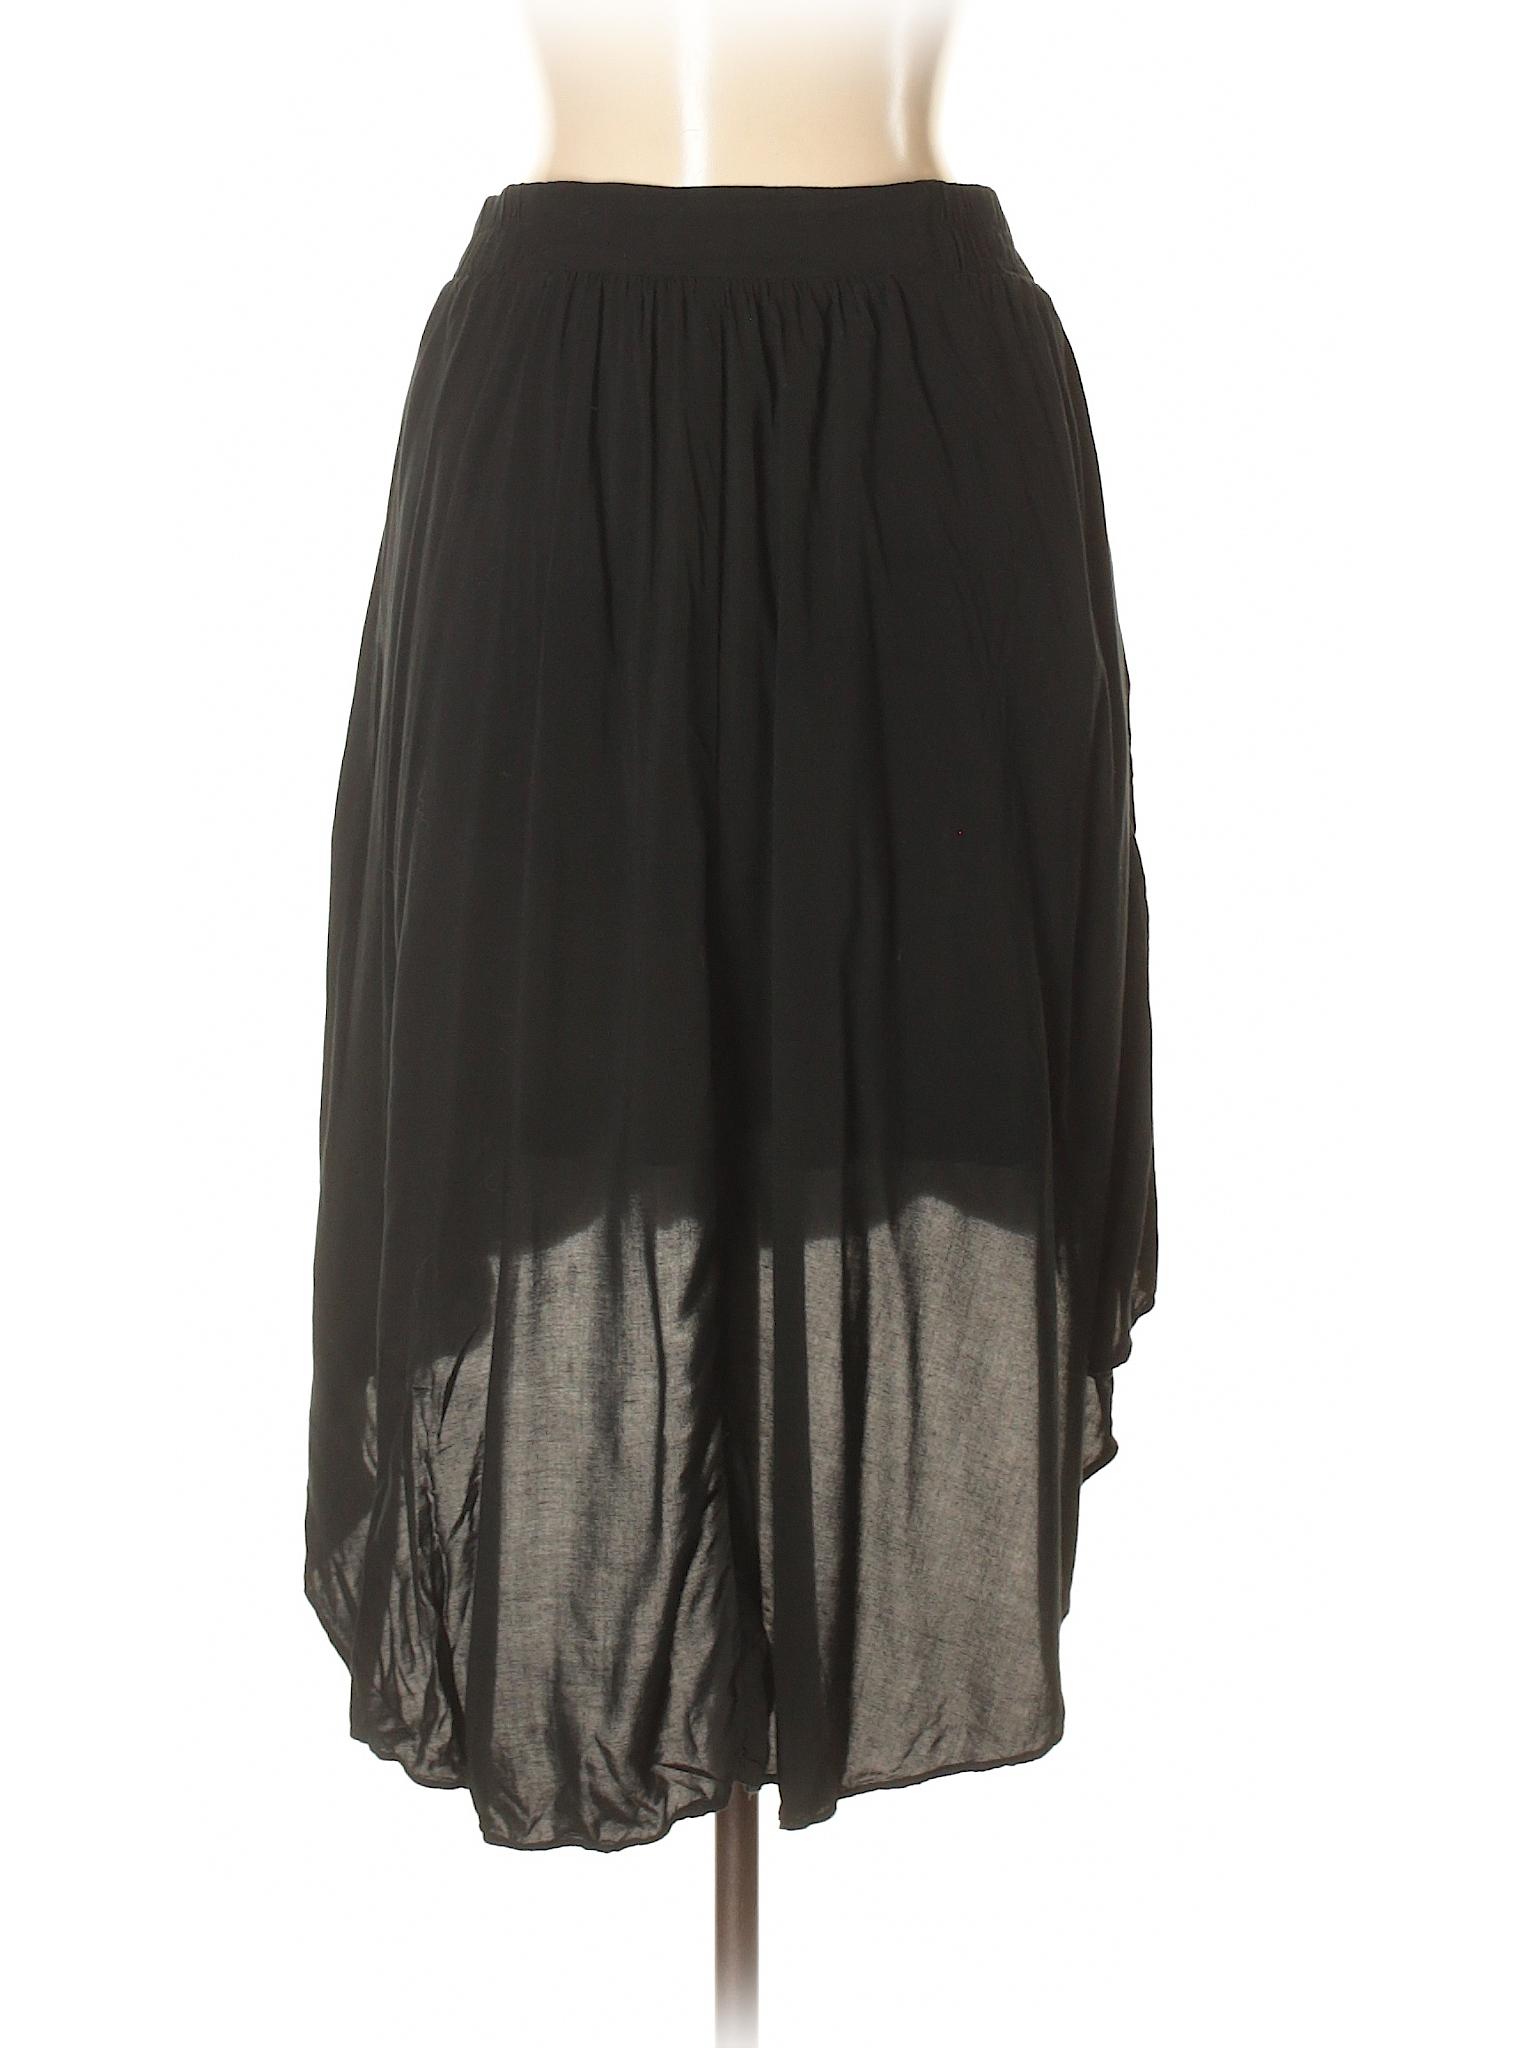 Skirt Casual LOFT Ann Taylor Boutique Outlet WnX1gZZq